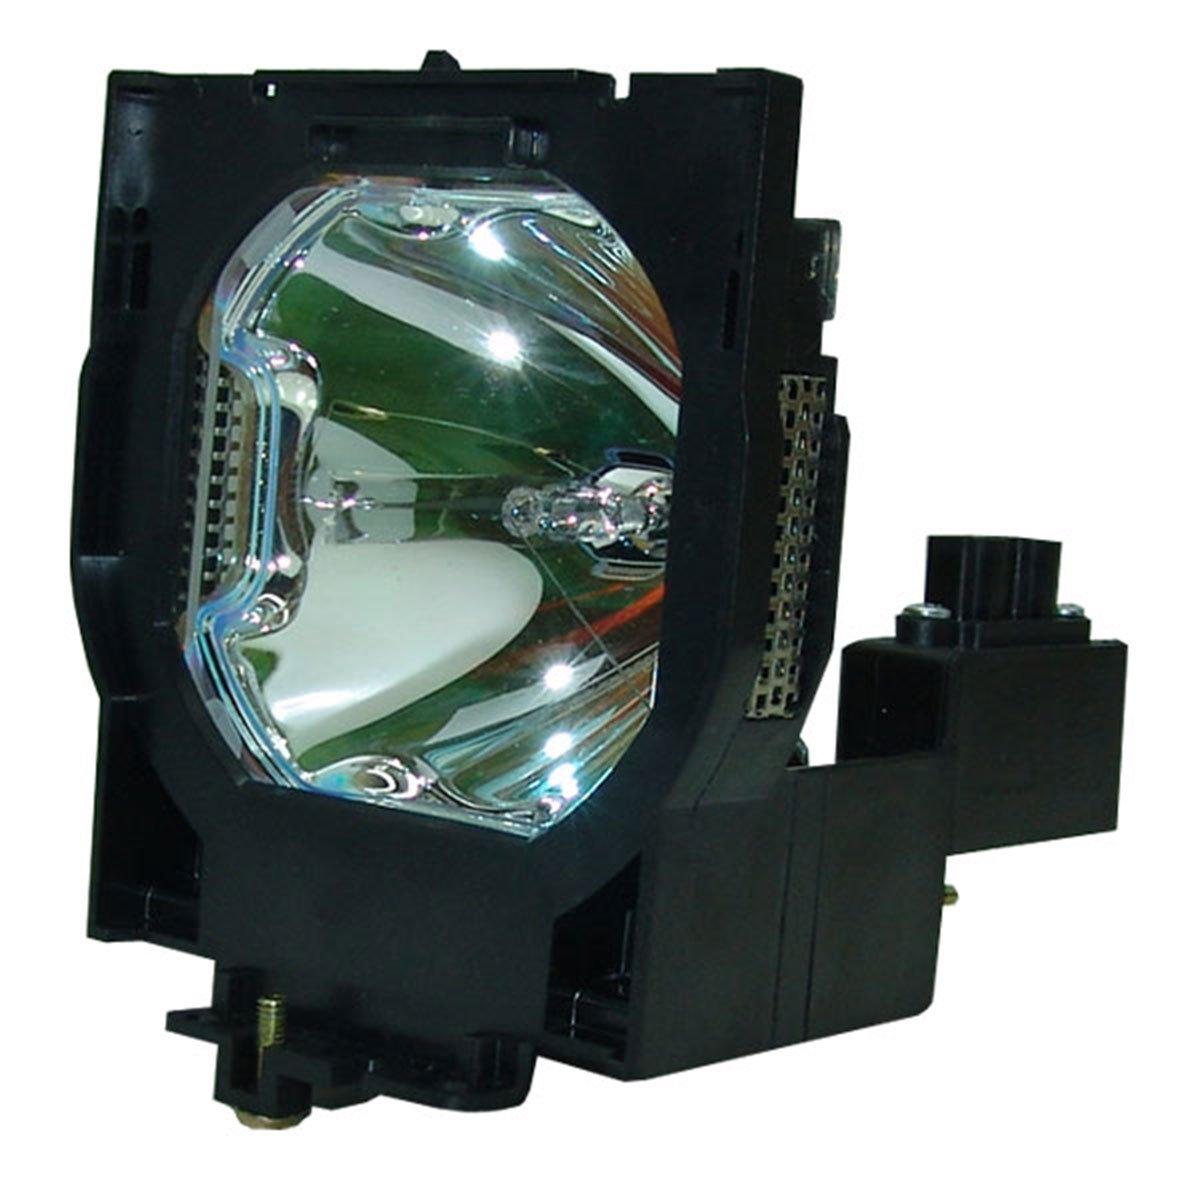 SpArc OEMプロジェクター交換用ランプ 囲い/電球付き Christie Roadrunner L8用 Platinum (Brighter/Durable) Platinum (Brighter/Durable) Lamp with Housing B07MLNPVZ9